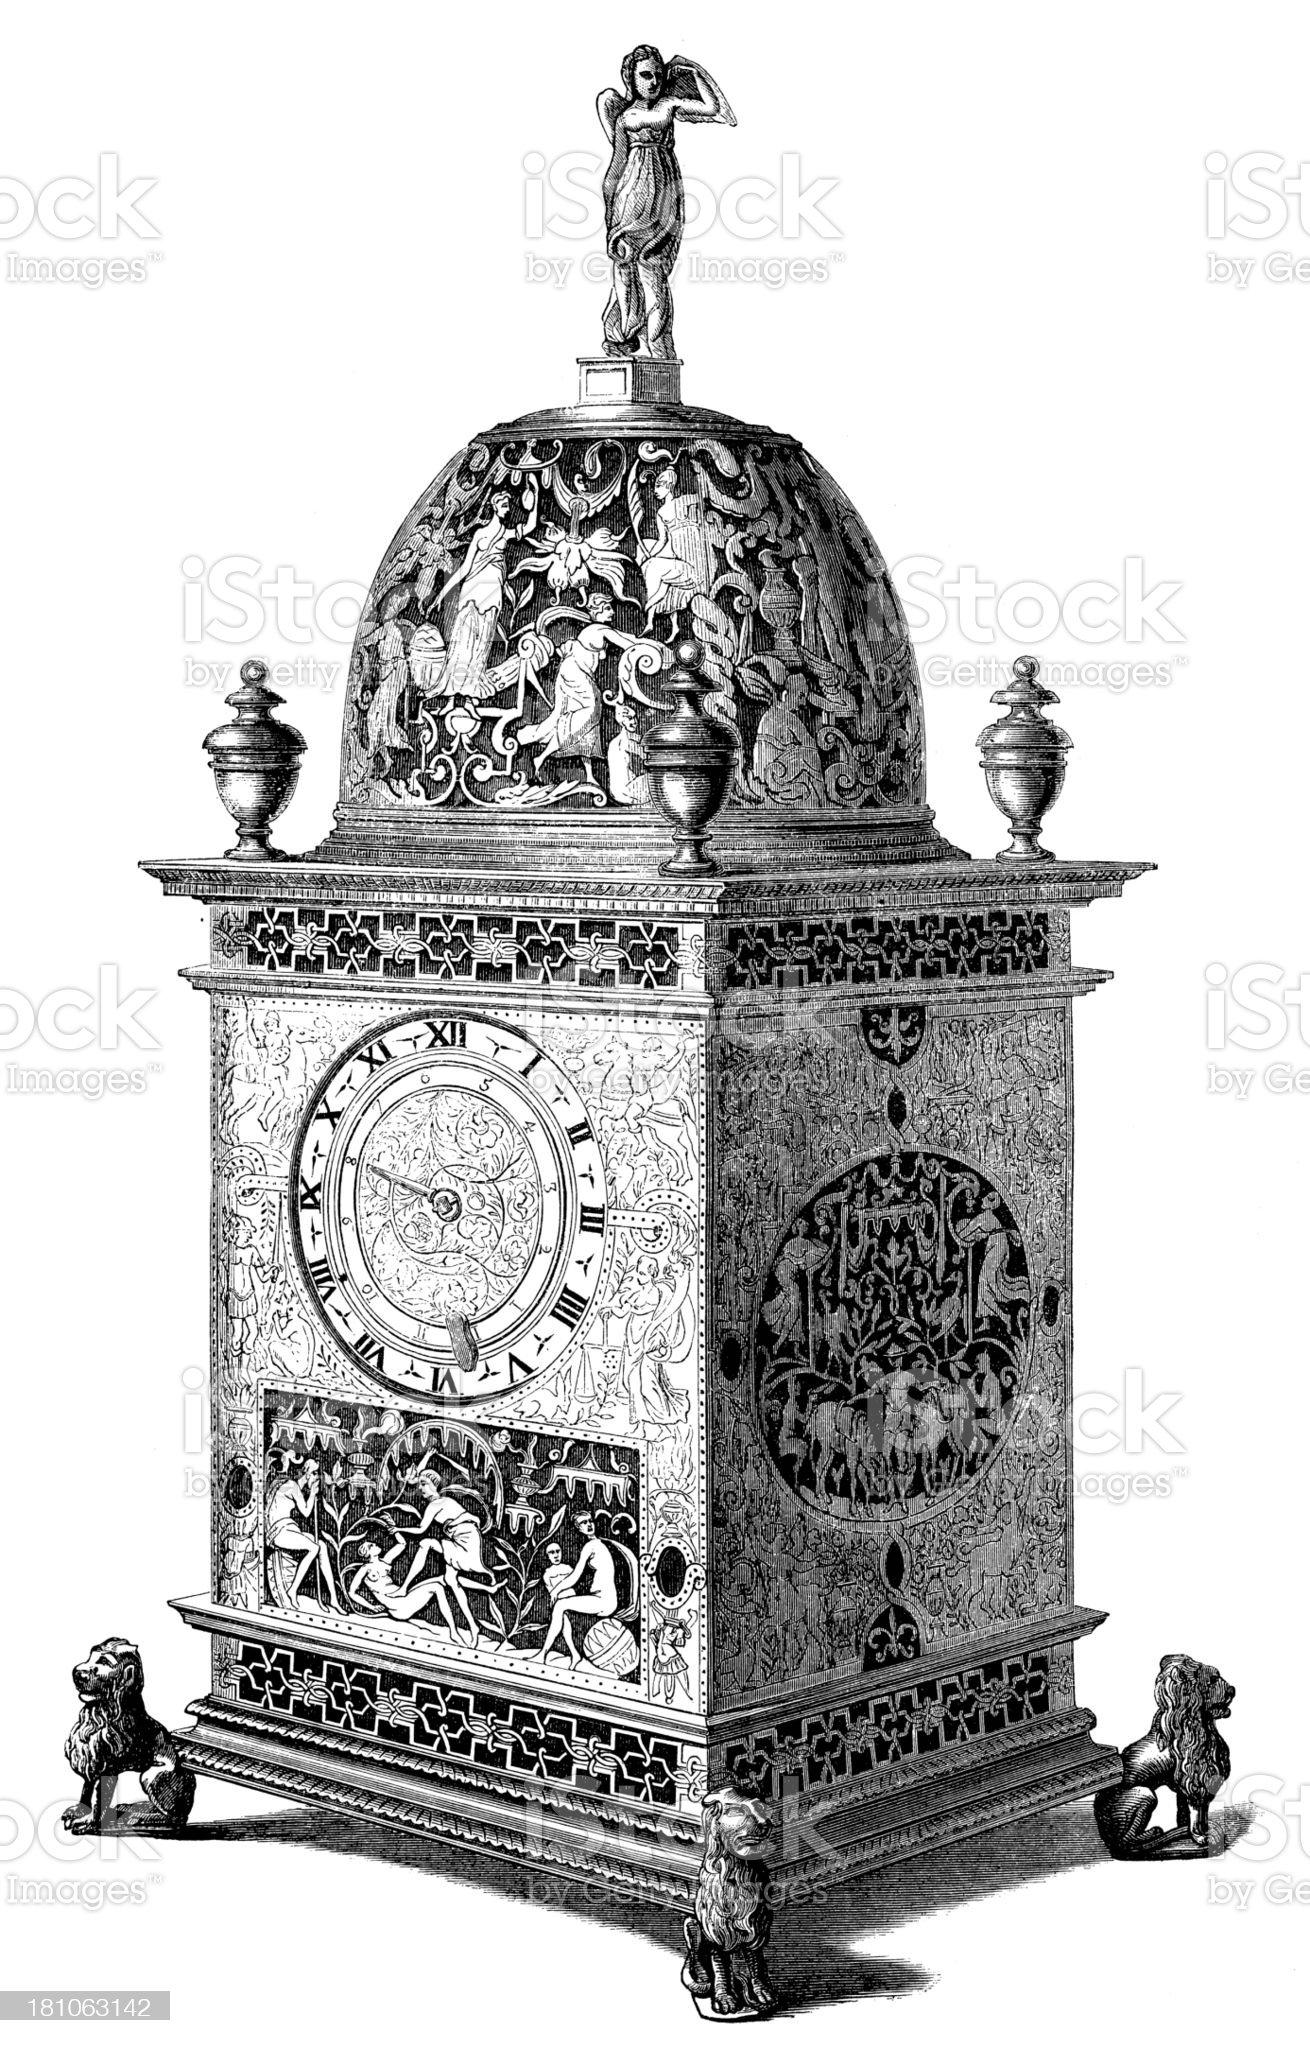 Antique illustration of 1600 clock royalty-free stock vector art